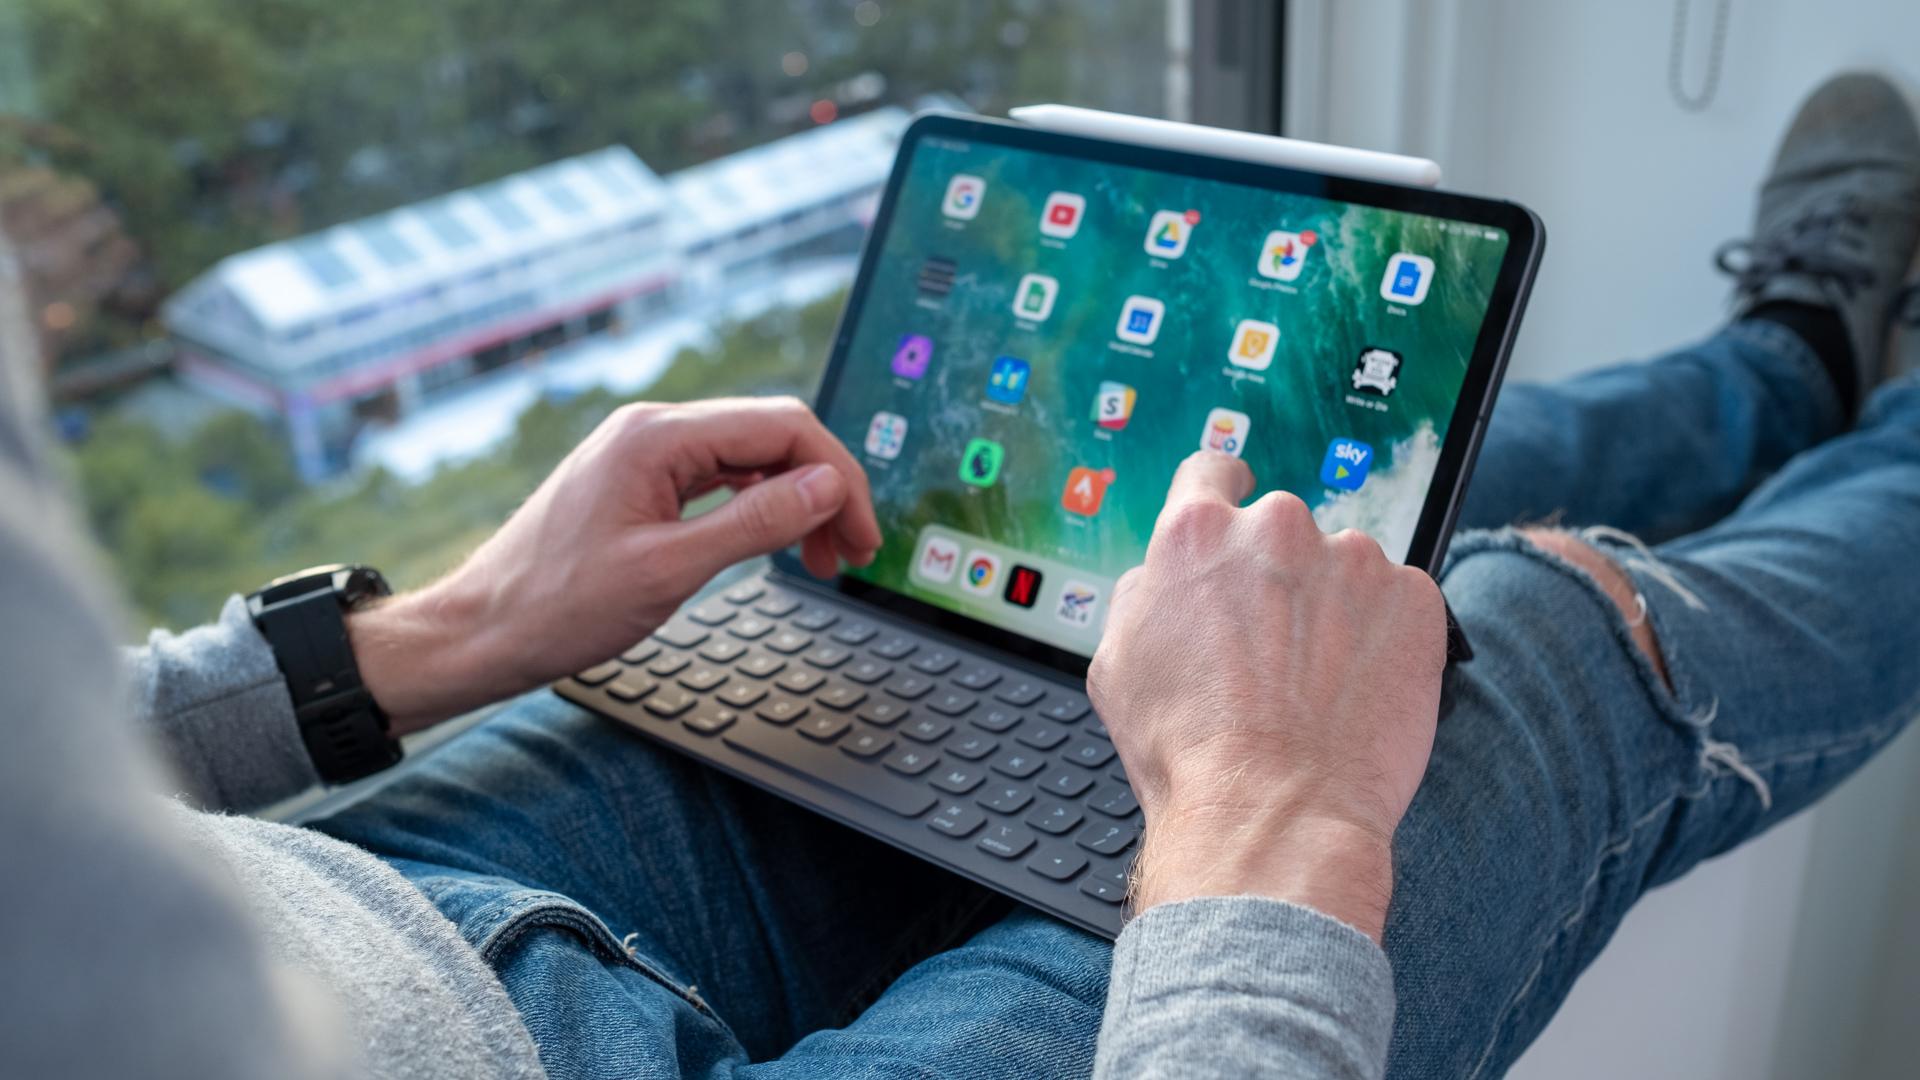 iPad Screen Resolution Display Size Information of All iPad Models